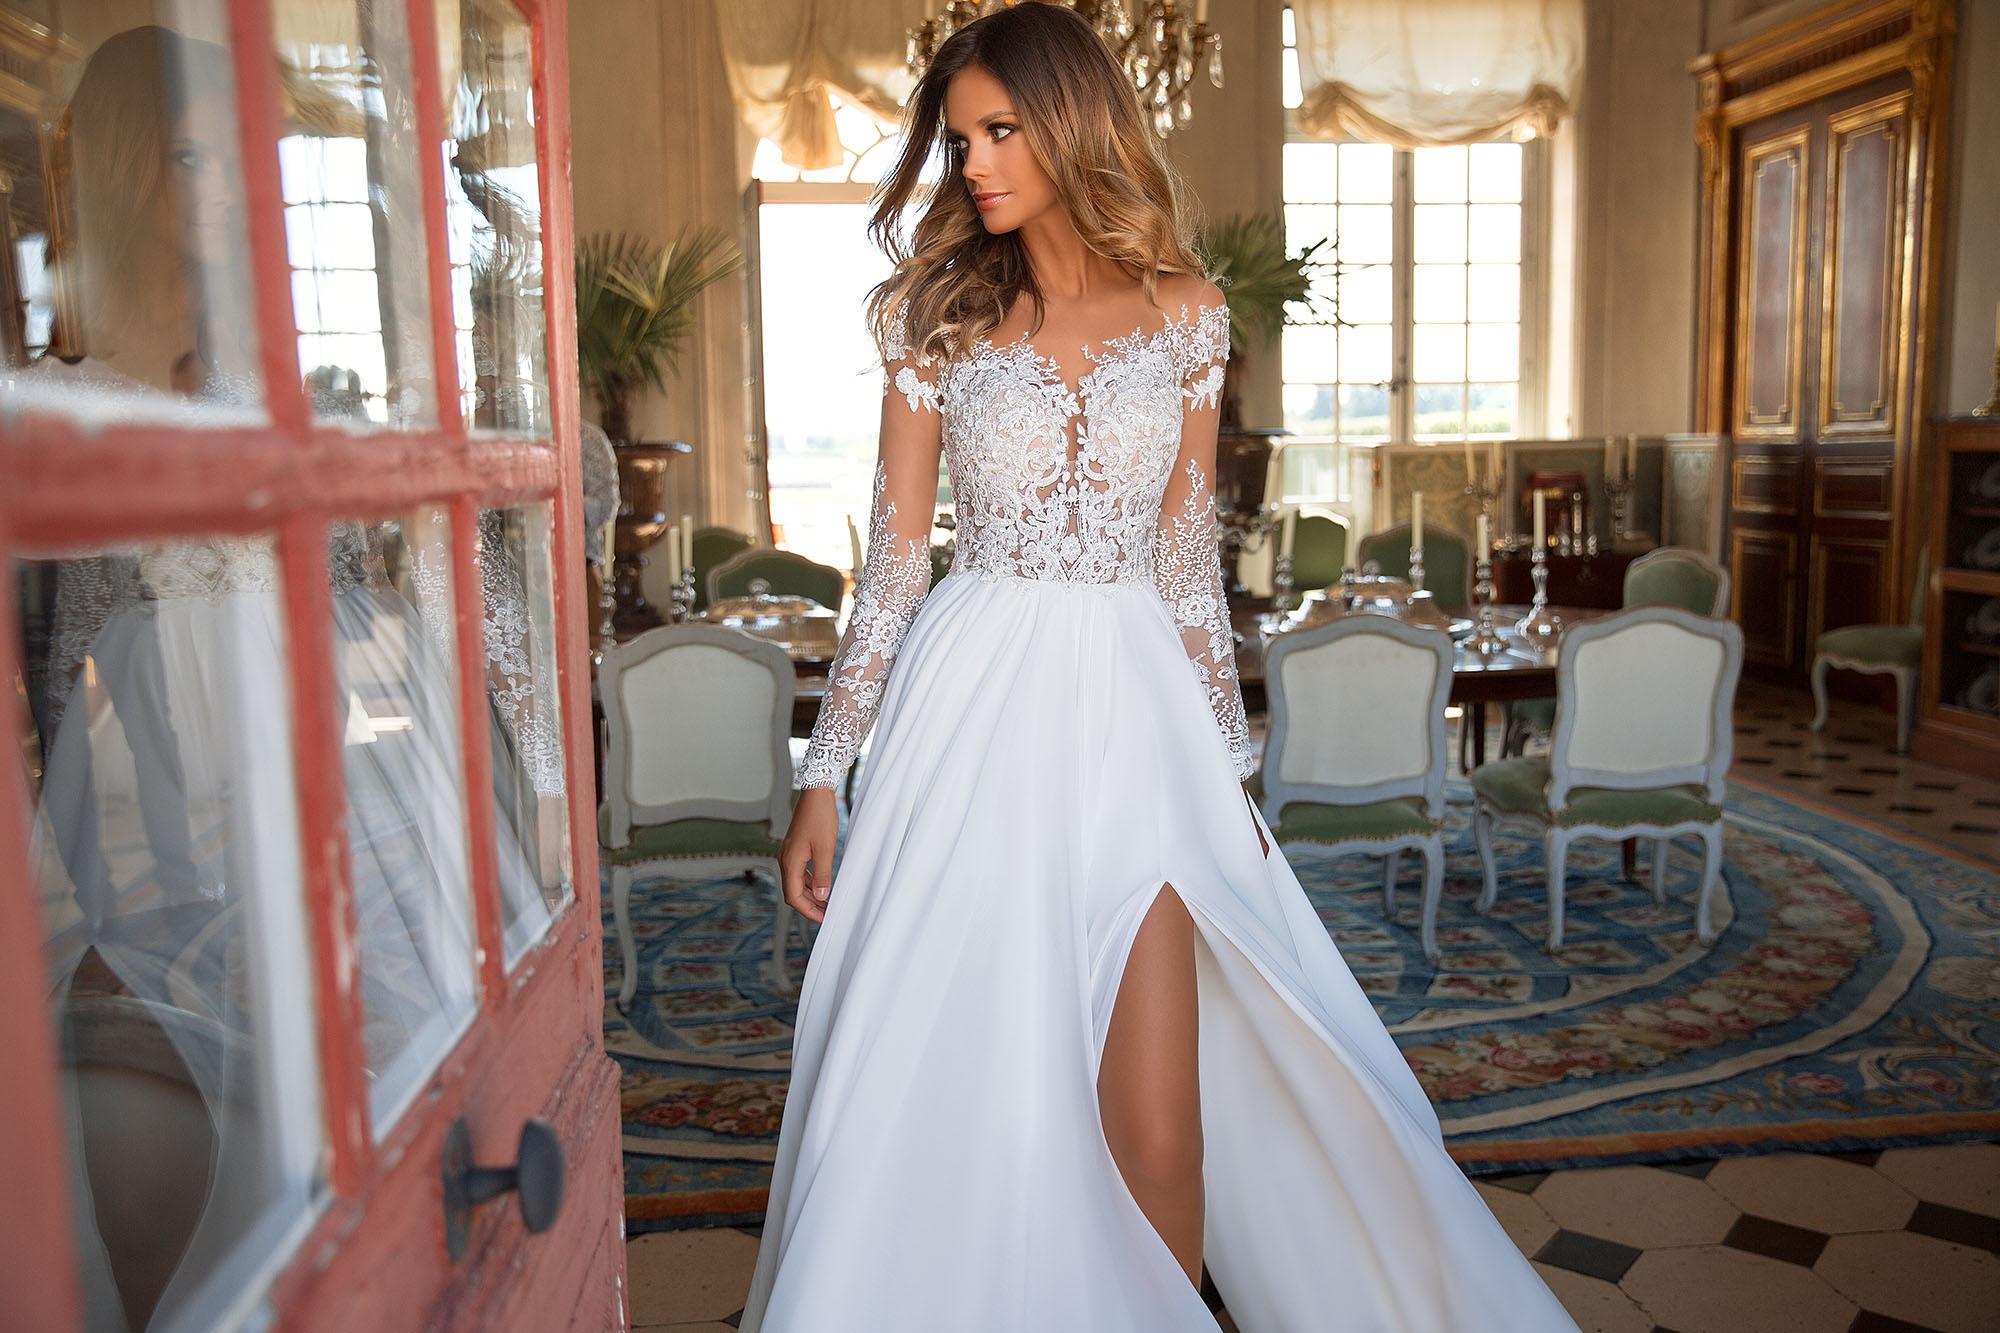 wedding dresses 2 in 1 photo - 1